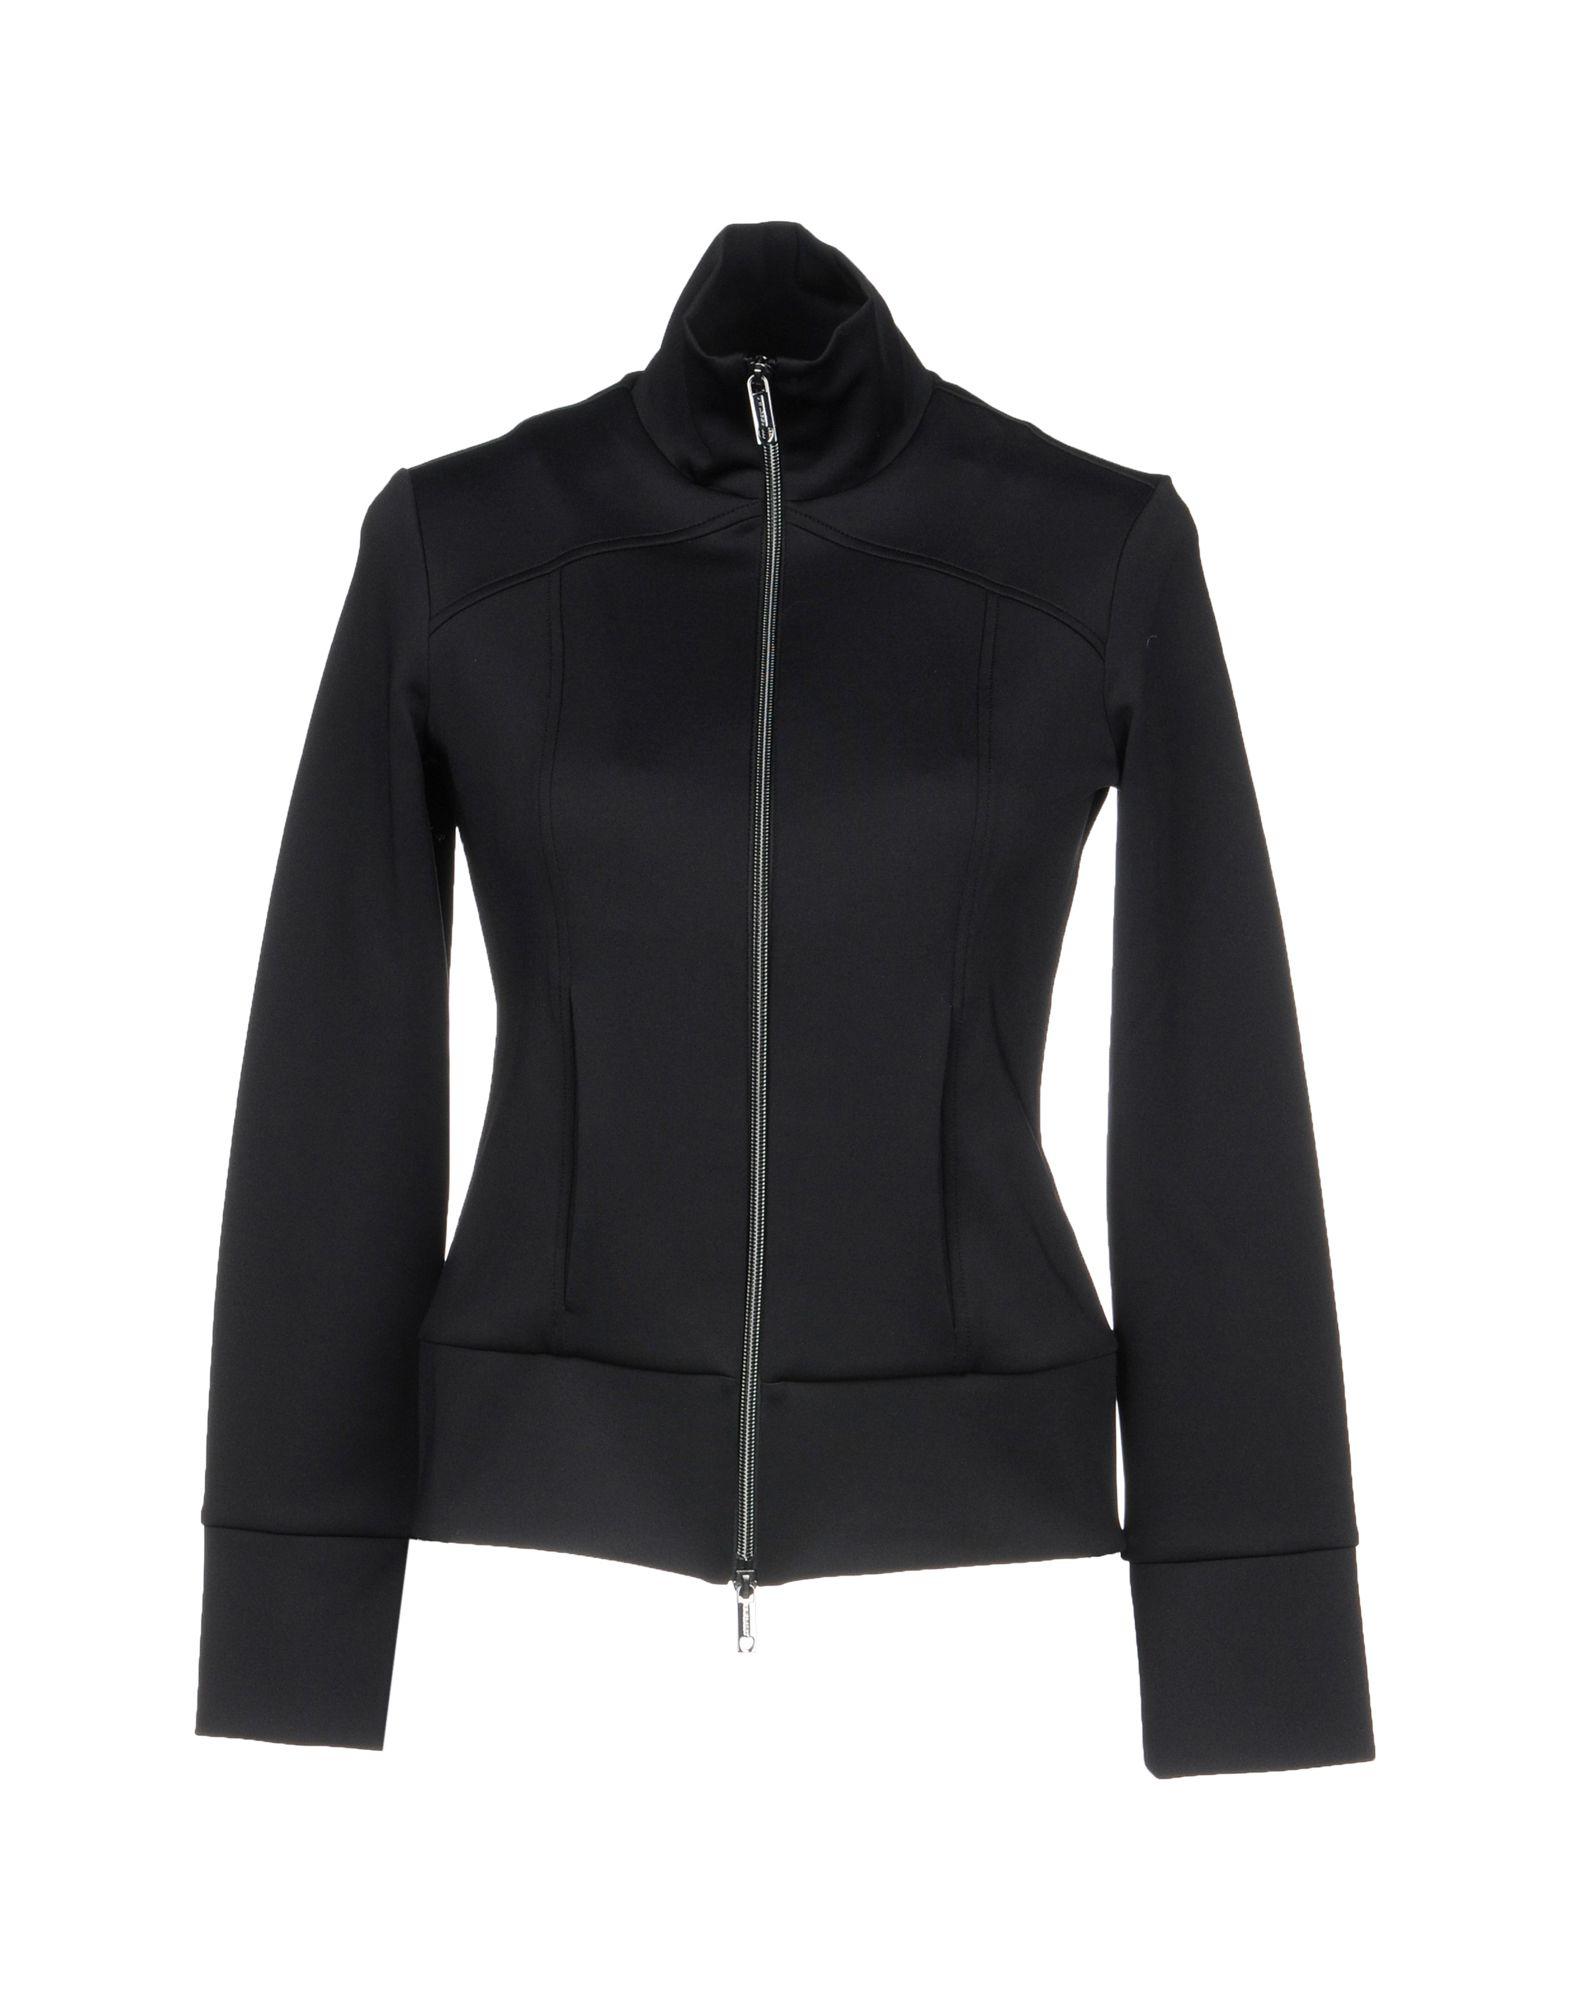 TWIN-SET Simona Barbieri Damen Sweatshirt Farbe Schwarz Größe 3